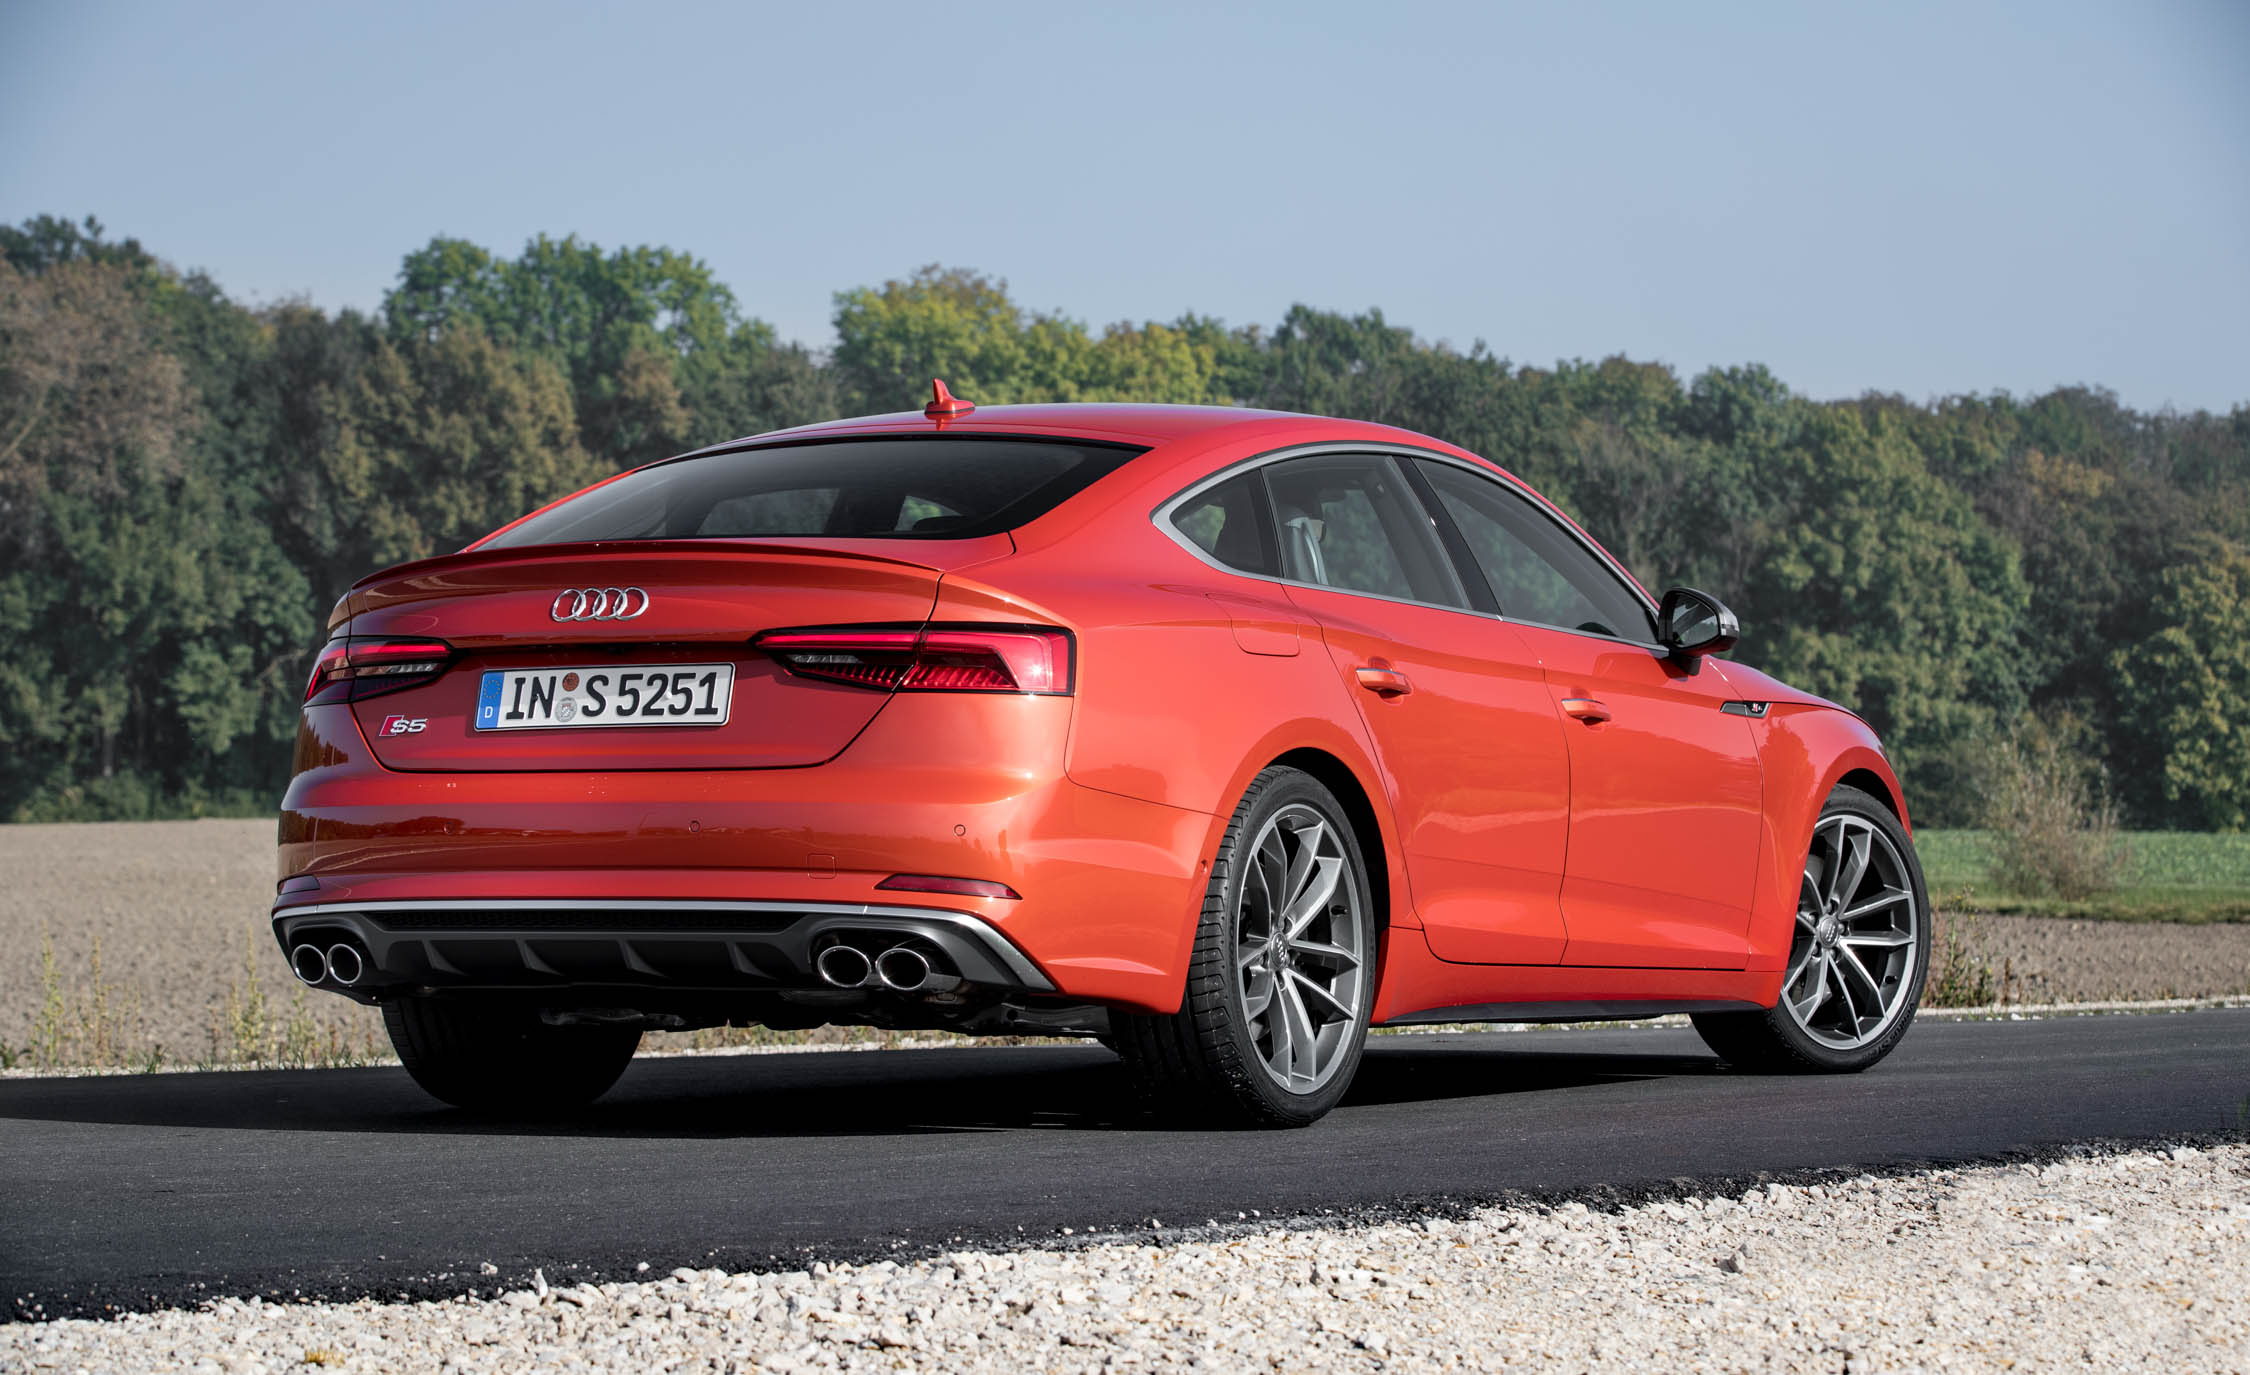 2017 Audi S5 Sportback (View 8 of 10)